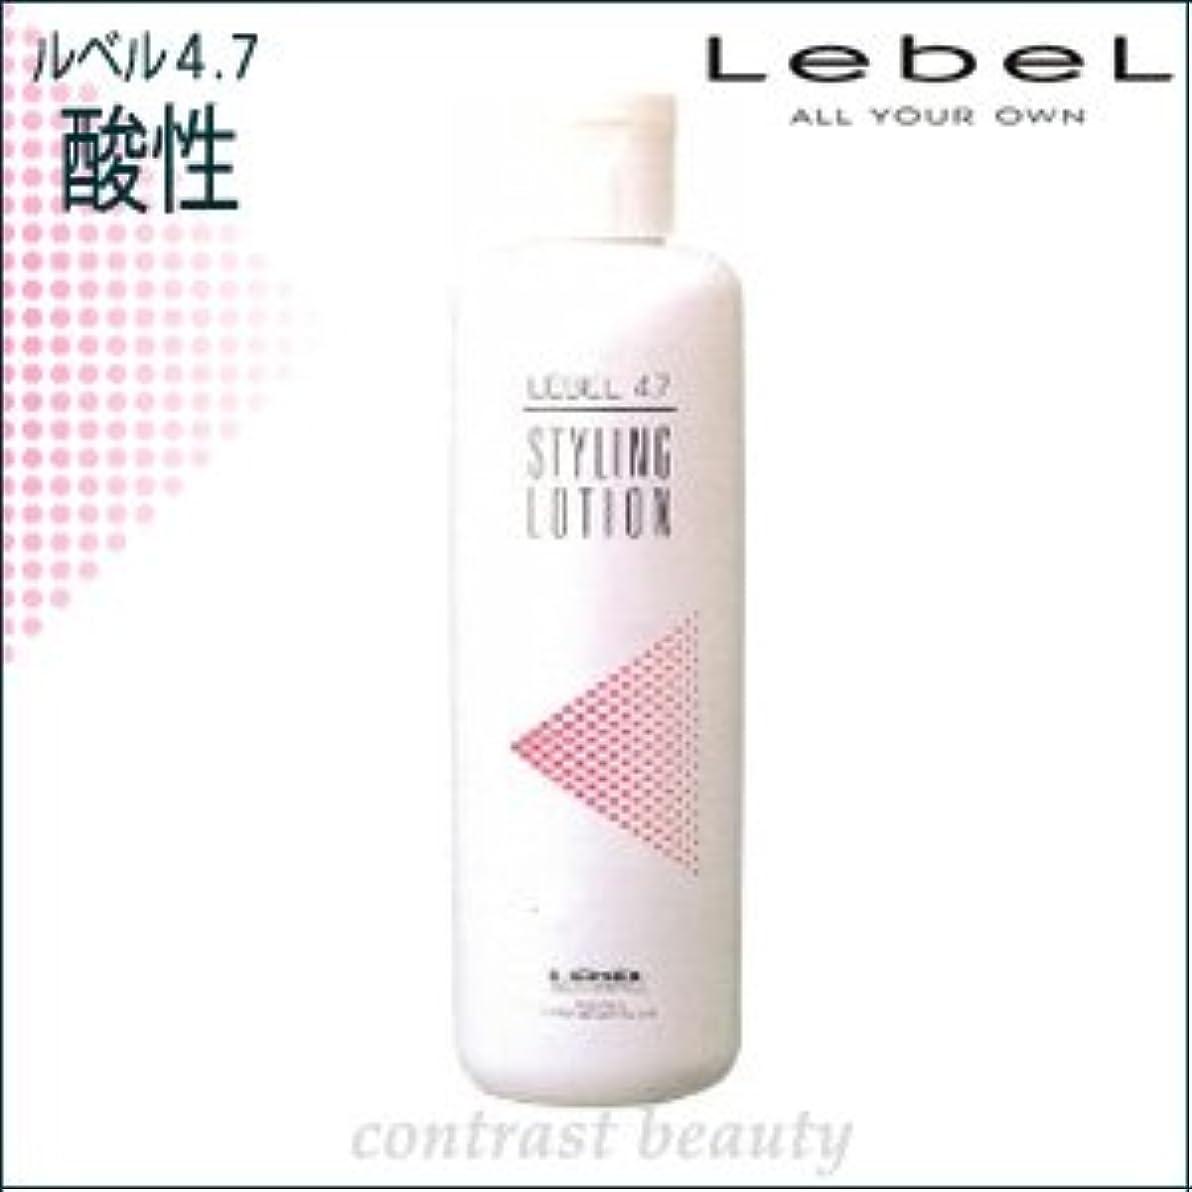 【X3個セット】 ルベルコスメティックス/LebeL 4.7酸性 スタイリングローション 400ml